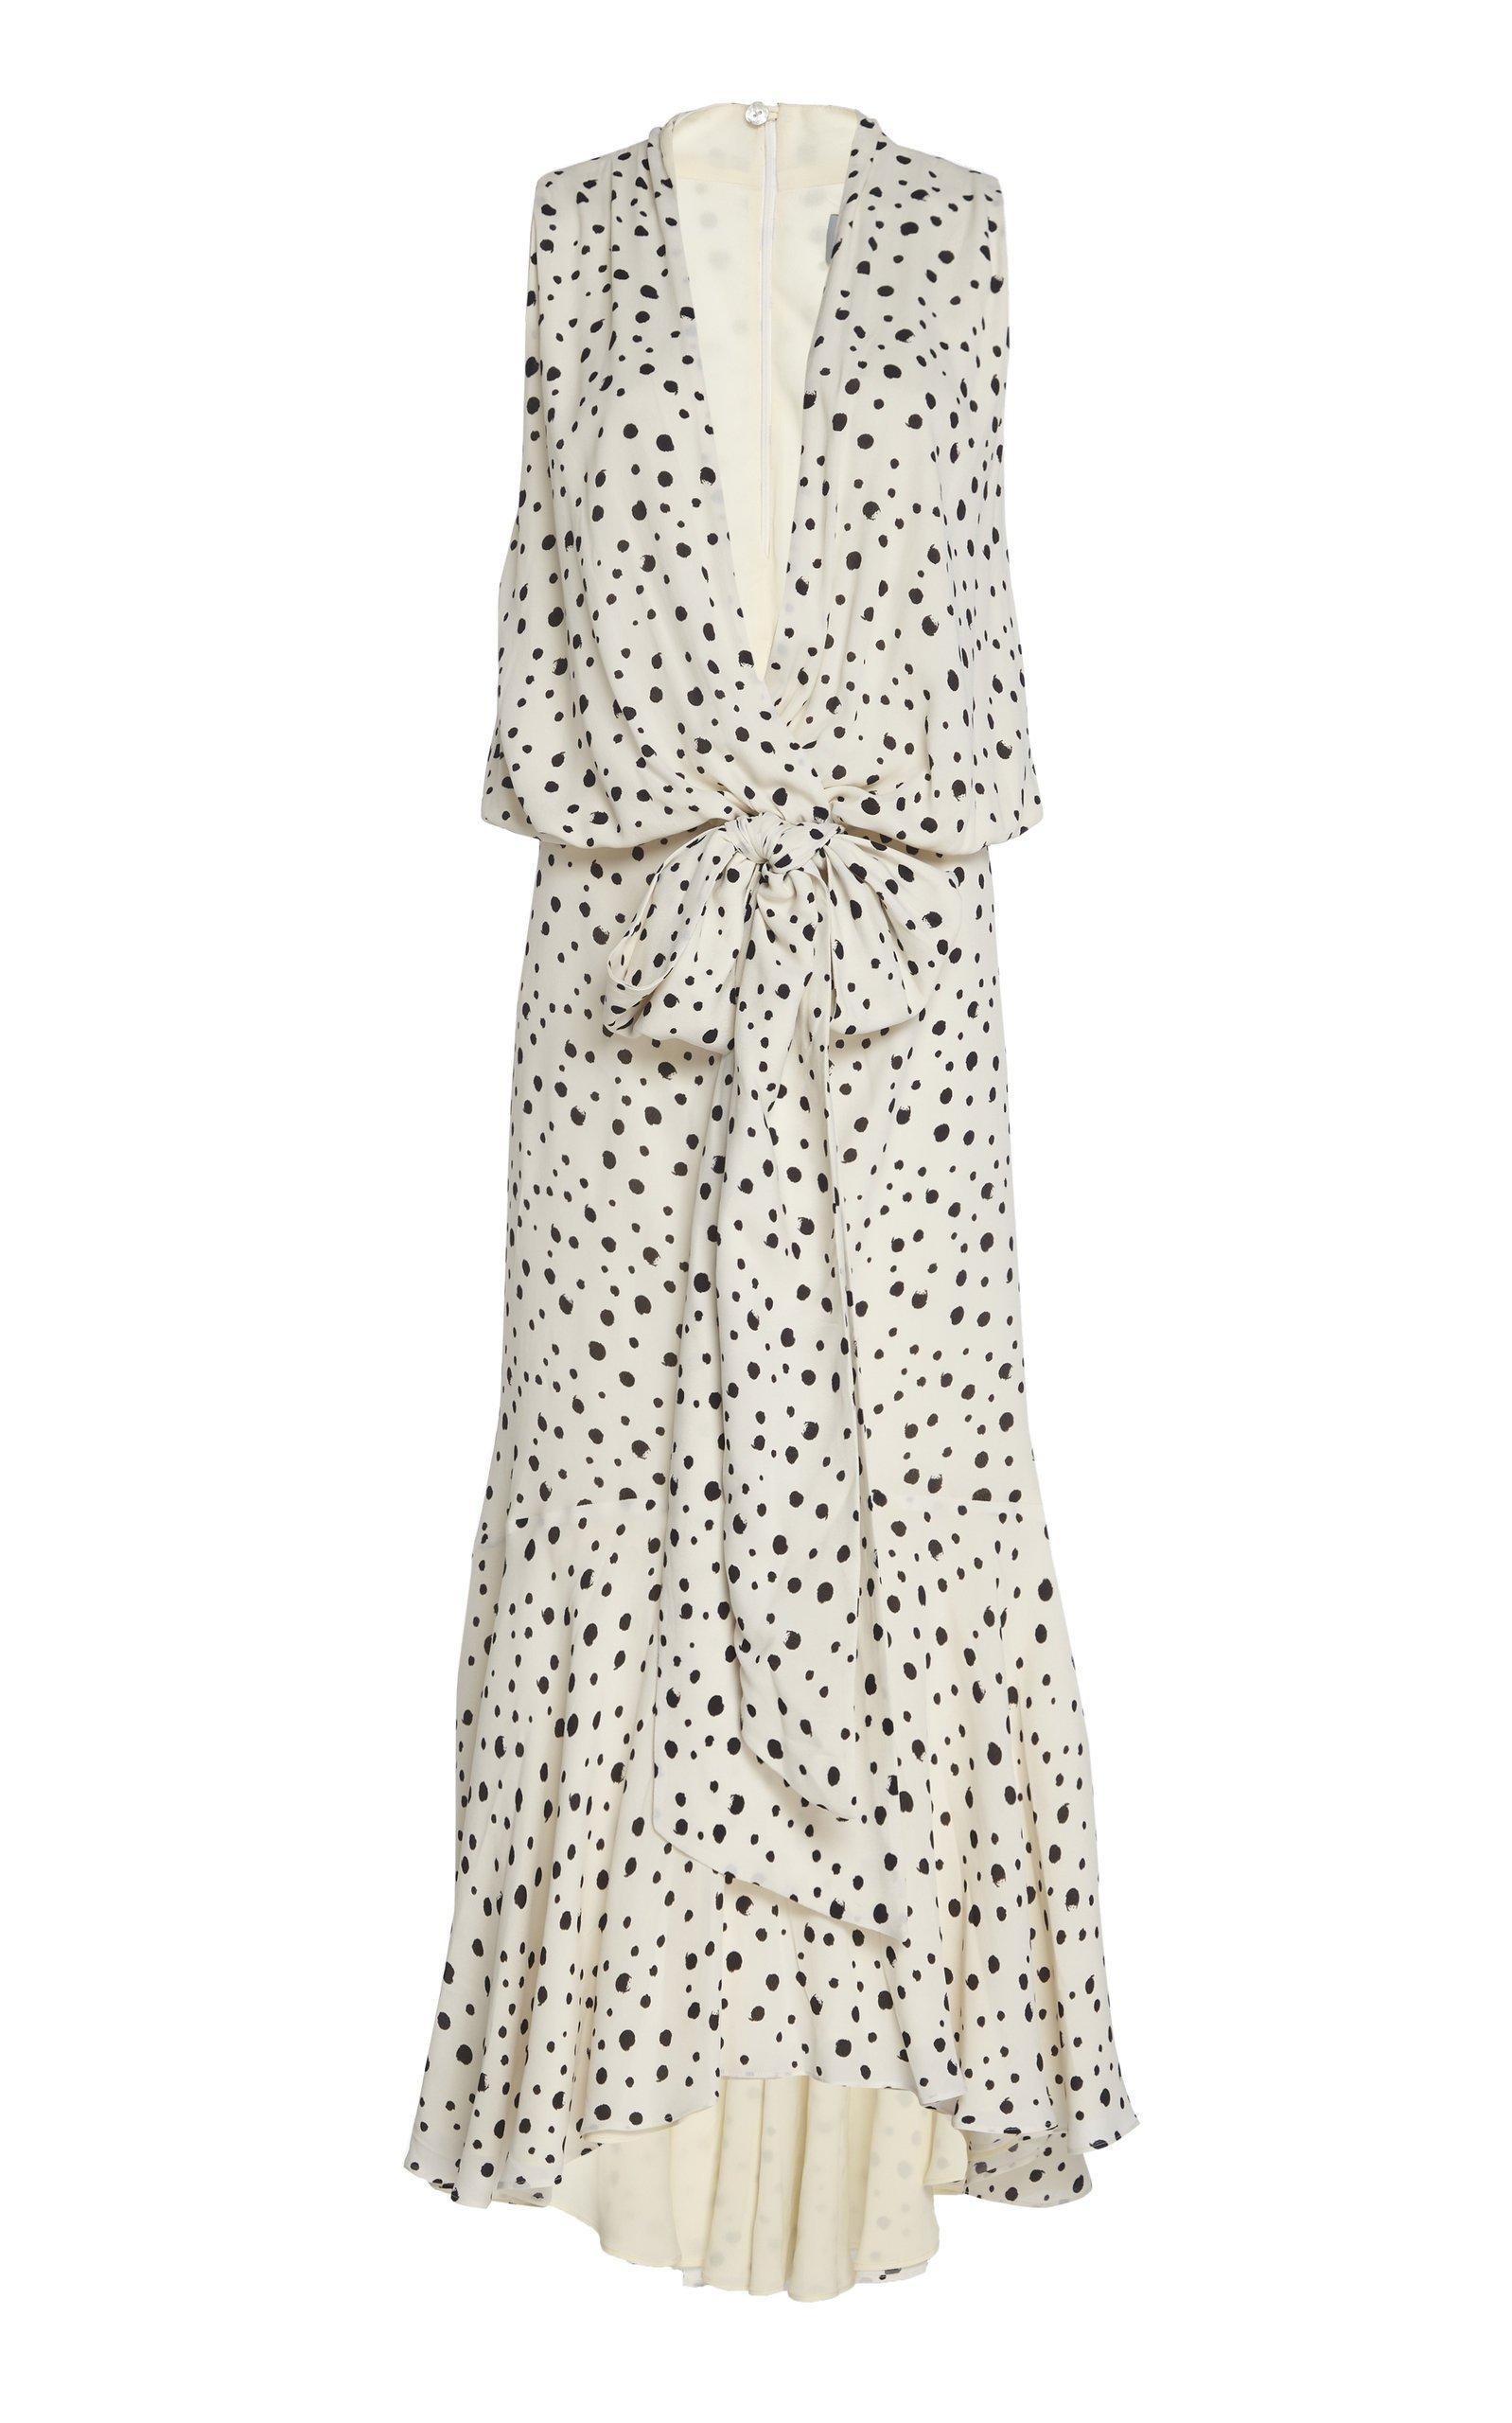 Silvia Tcherassi Nini Crepe De Chine Dress Size: XS